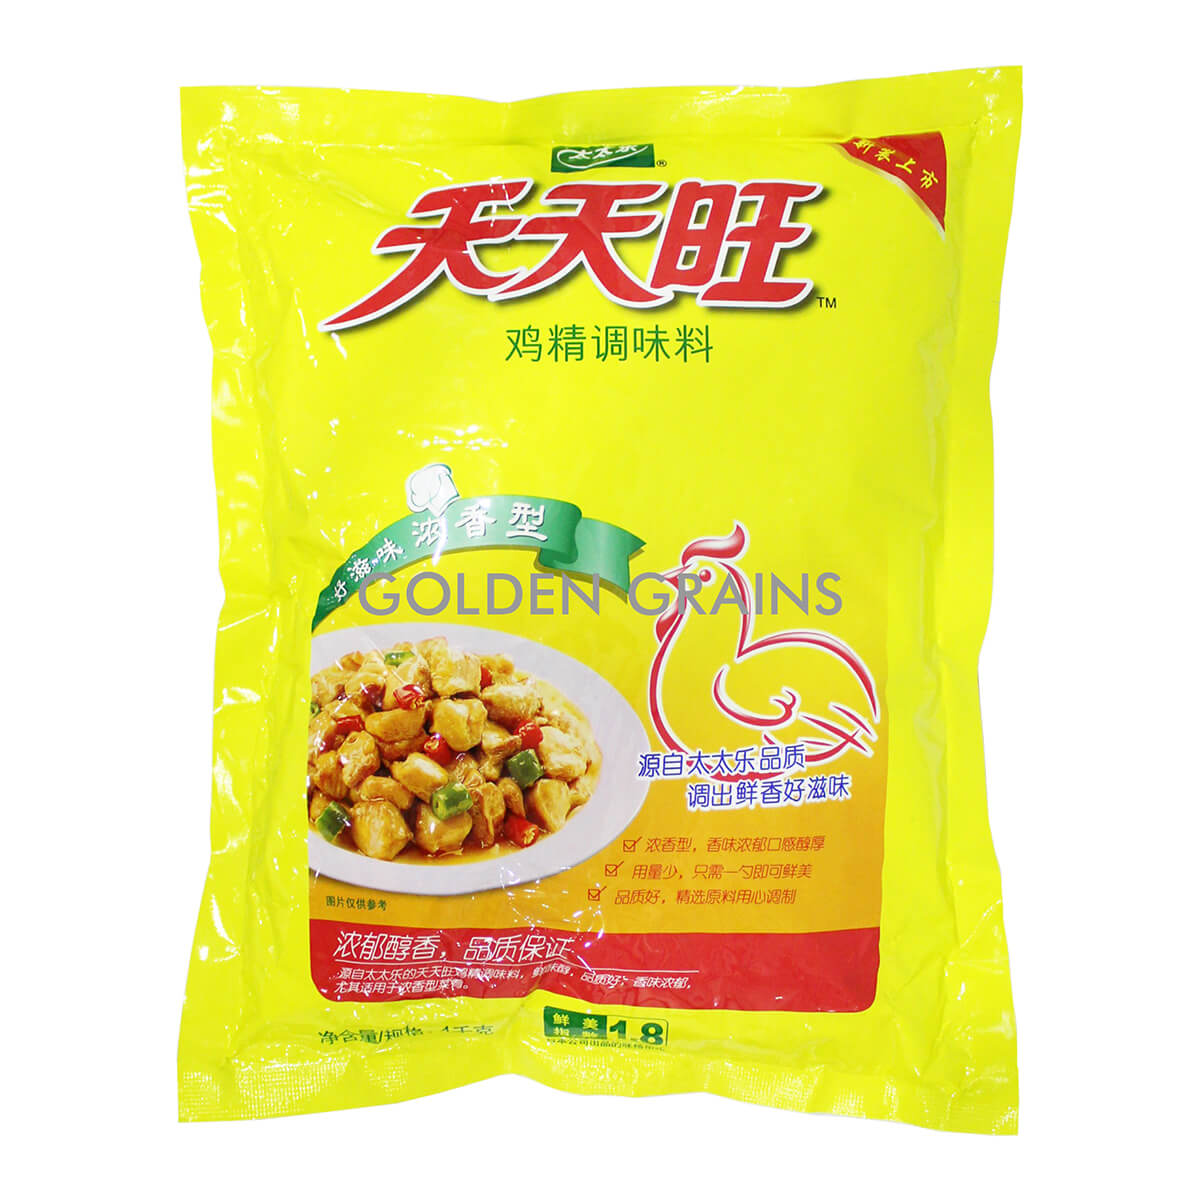 Golden Grains Mrs Lotte Tianwang - Chicken Seasoning Powder - Front.jpg